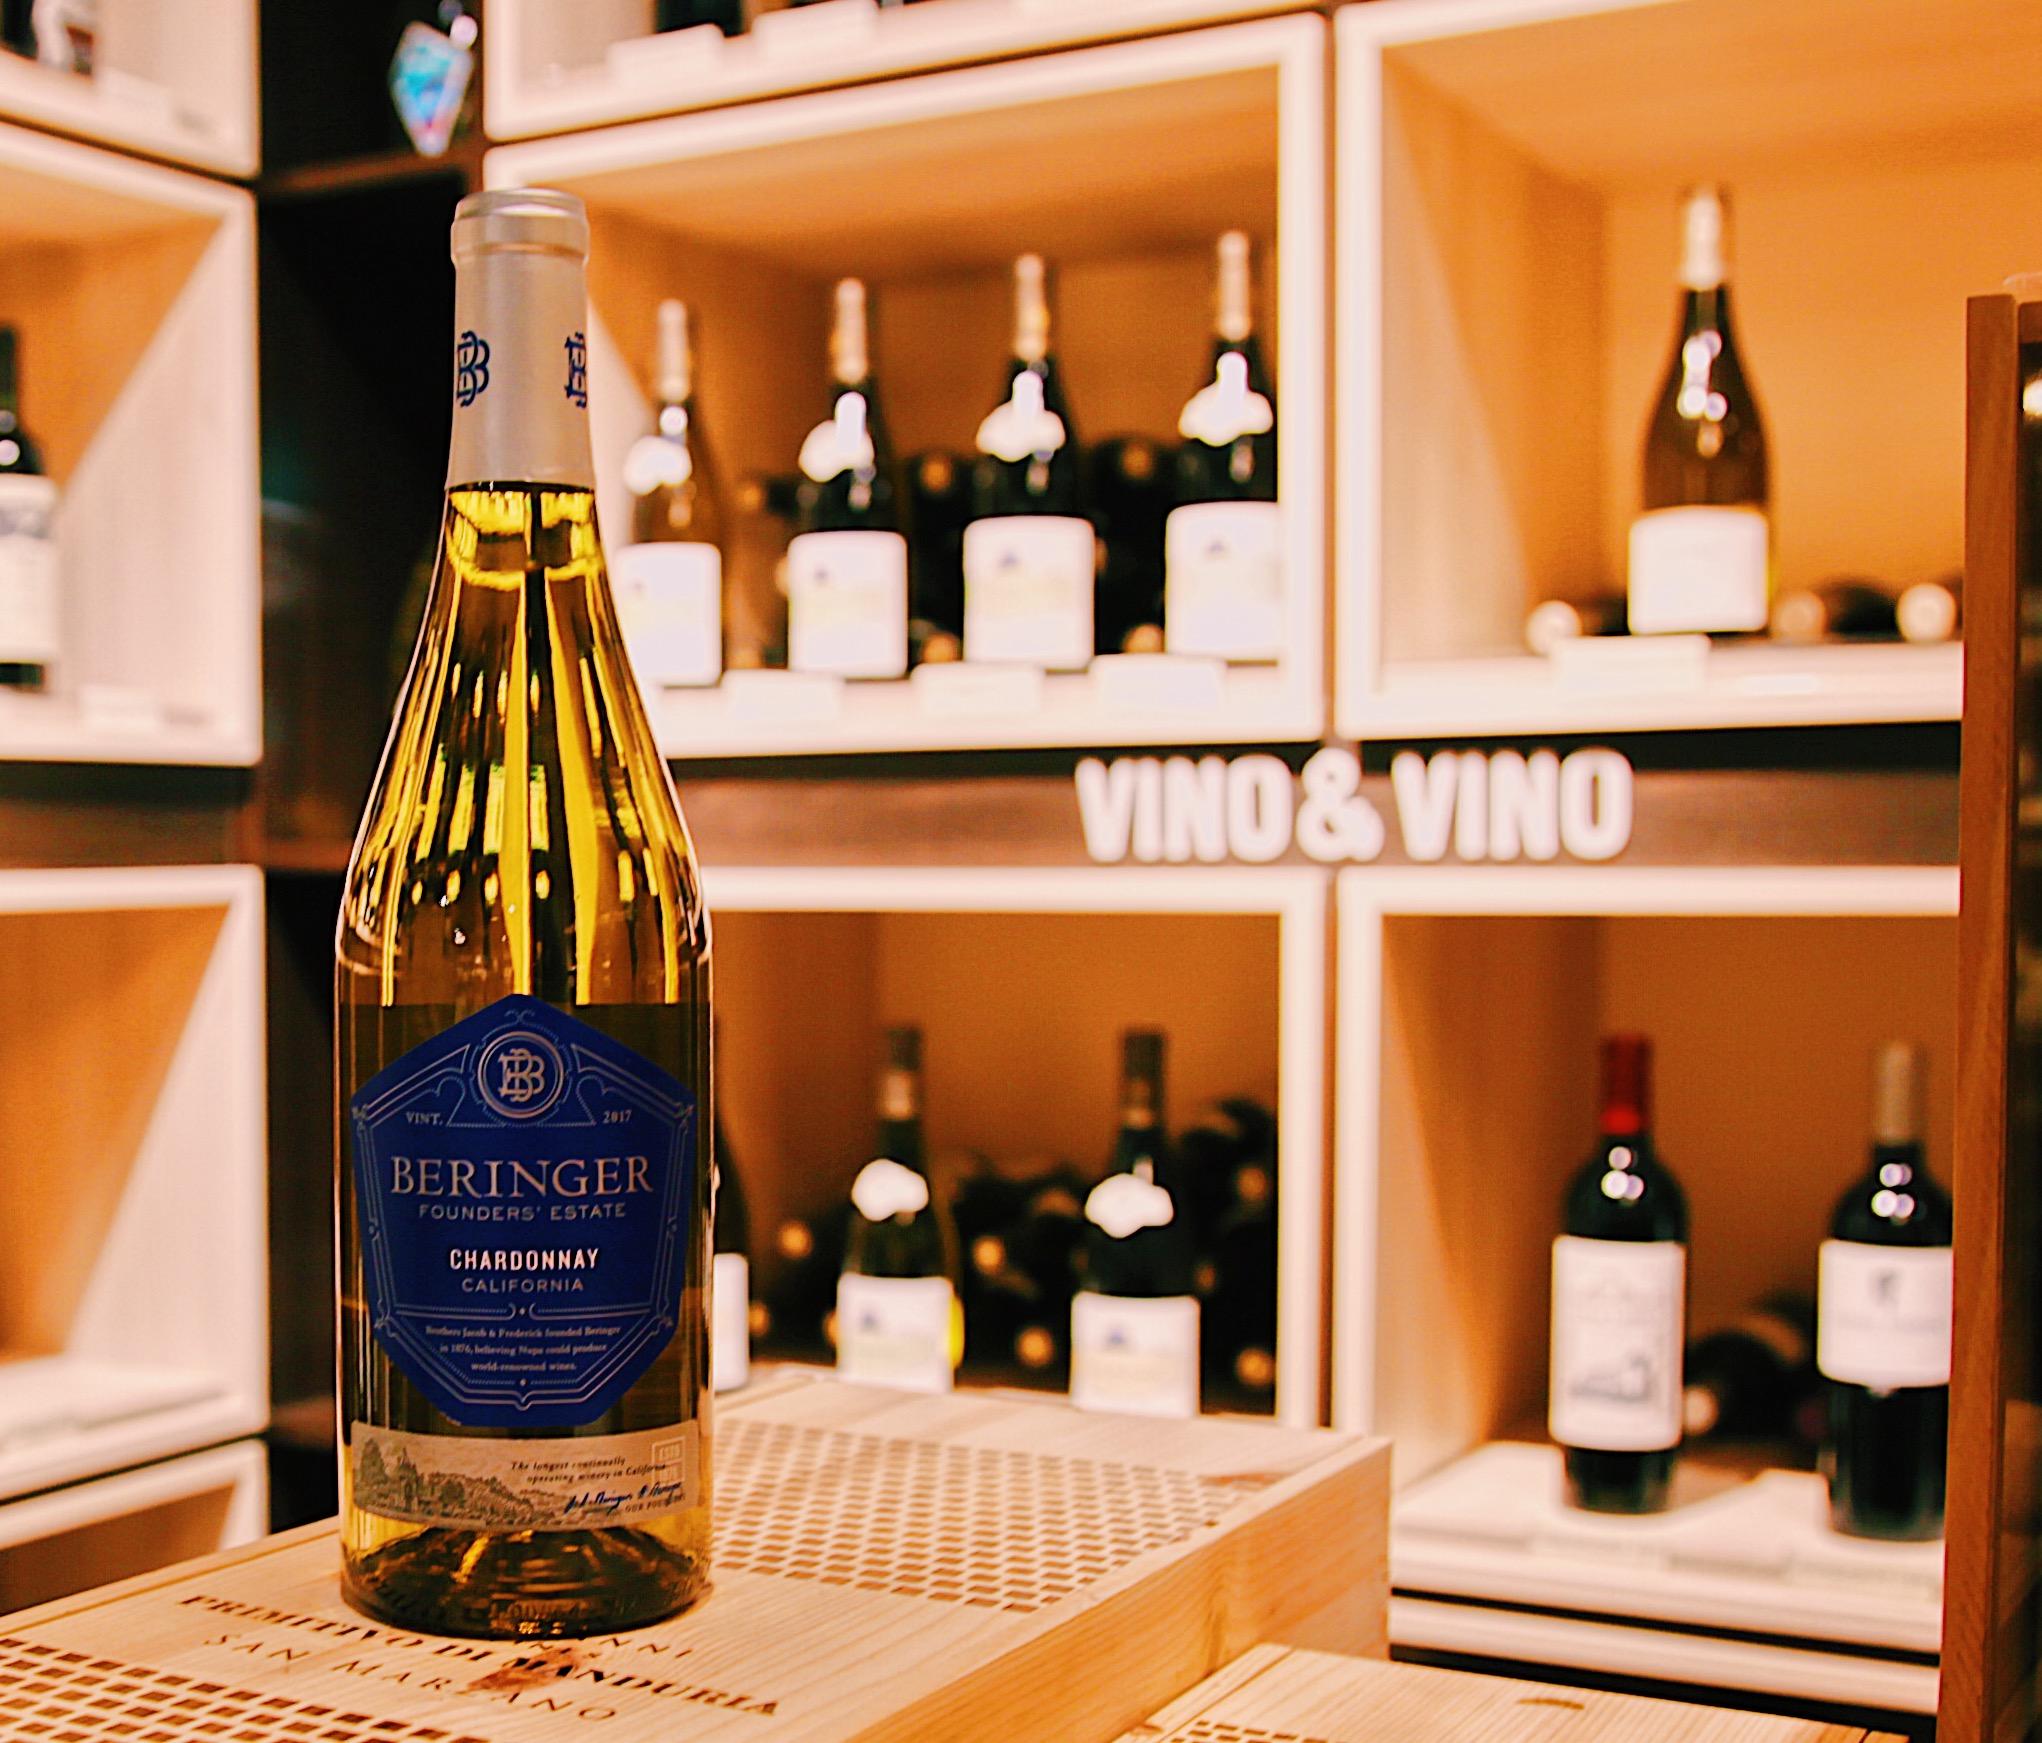 Beringer – Chardonnay